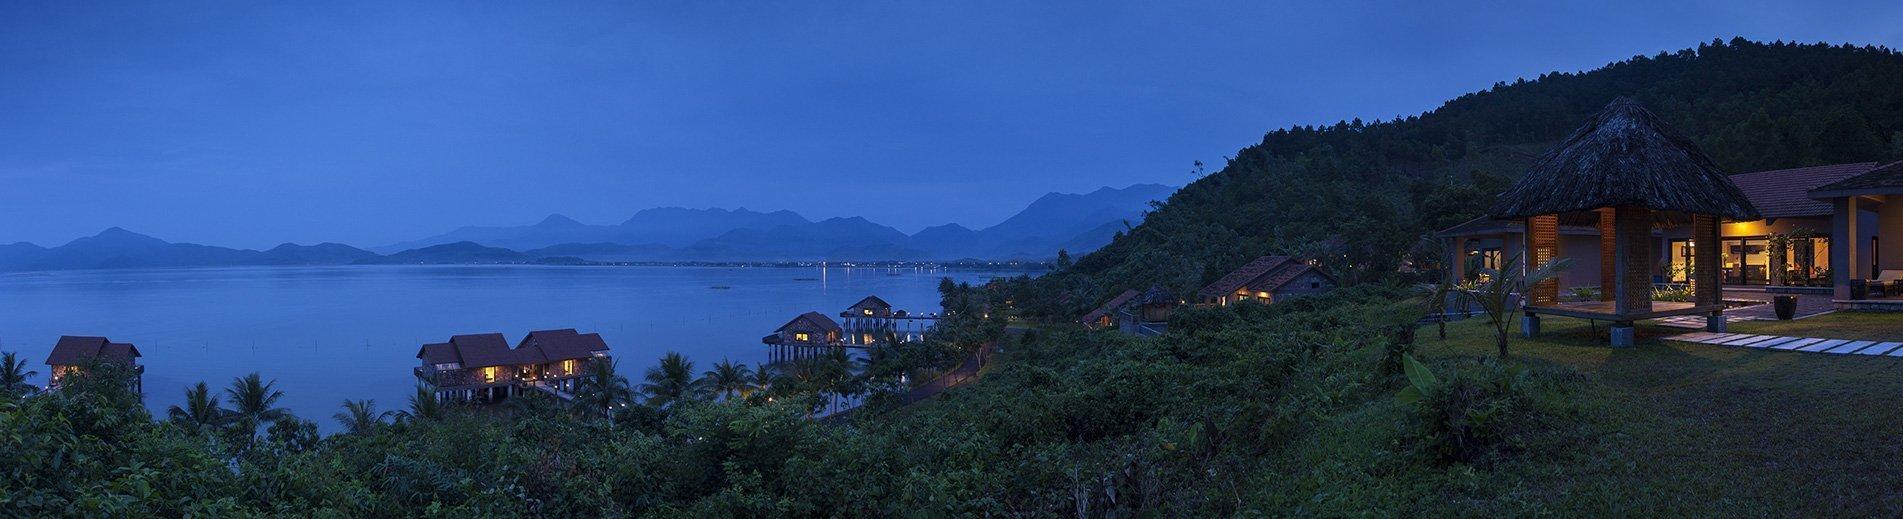 The Vedana Lagoon resort & spa at dusk. Hue, Vietnam.